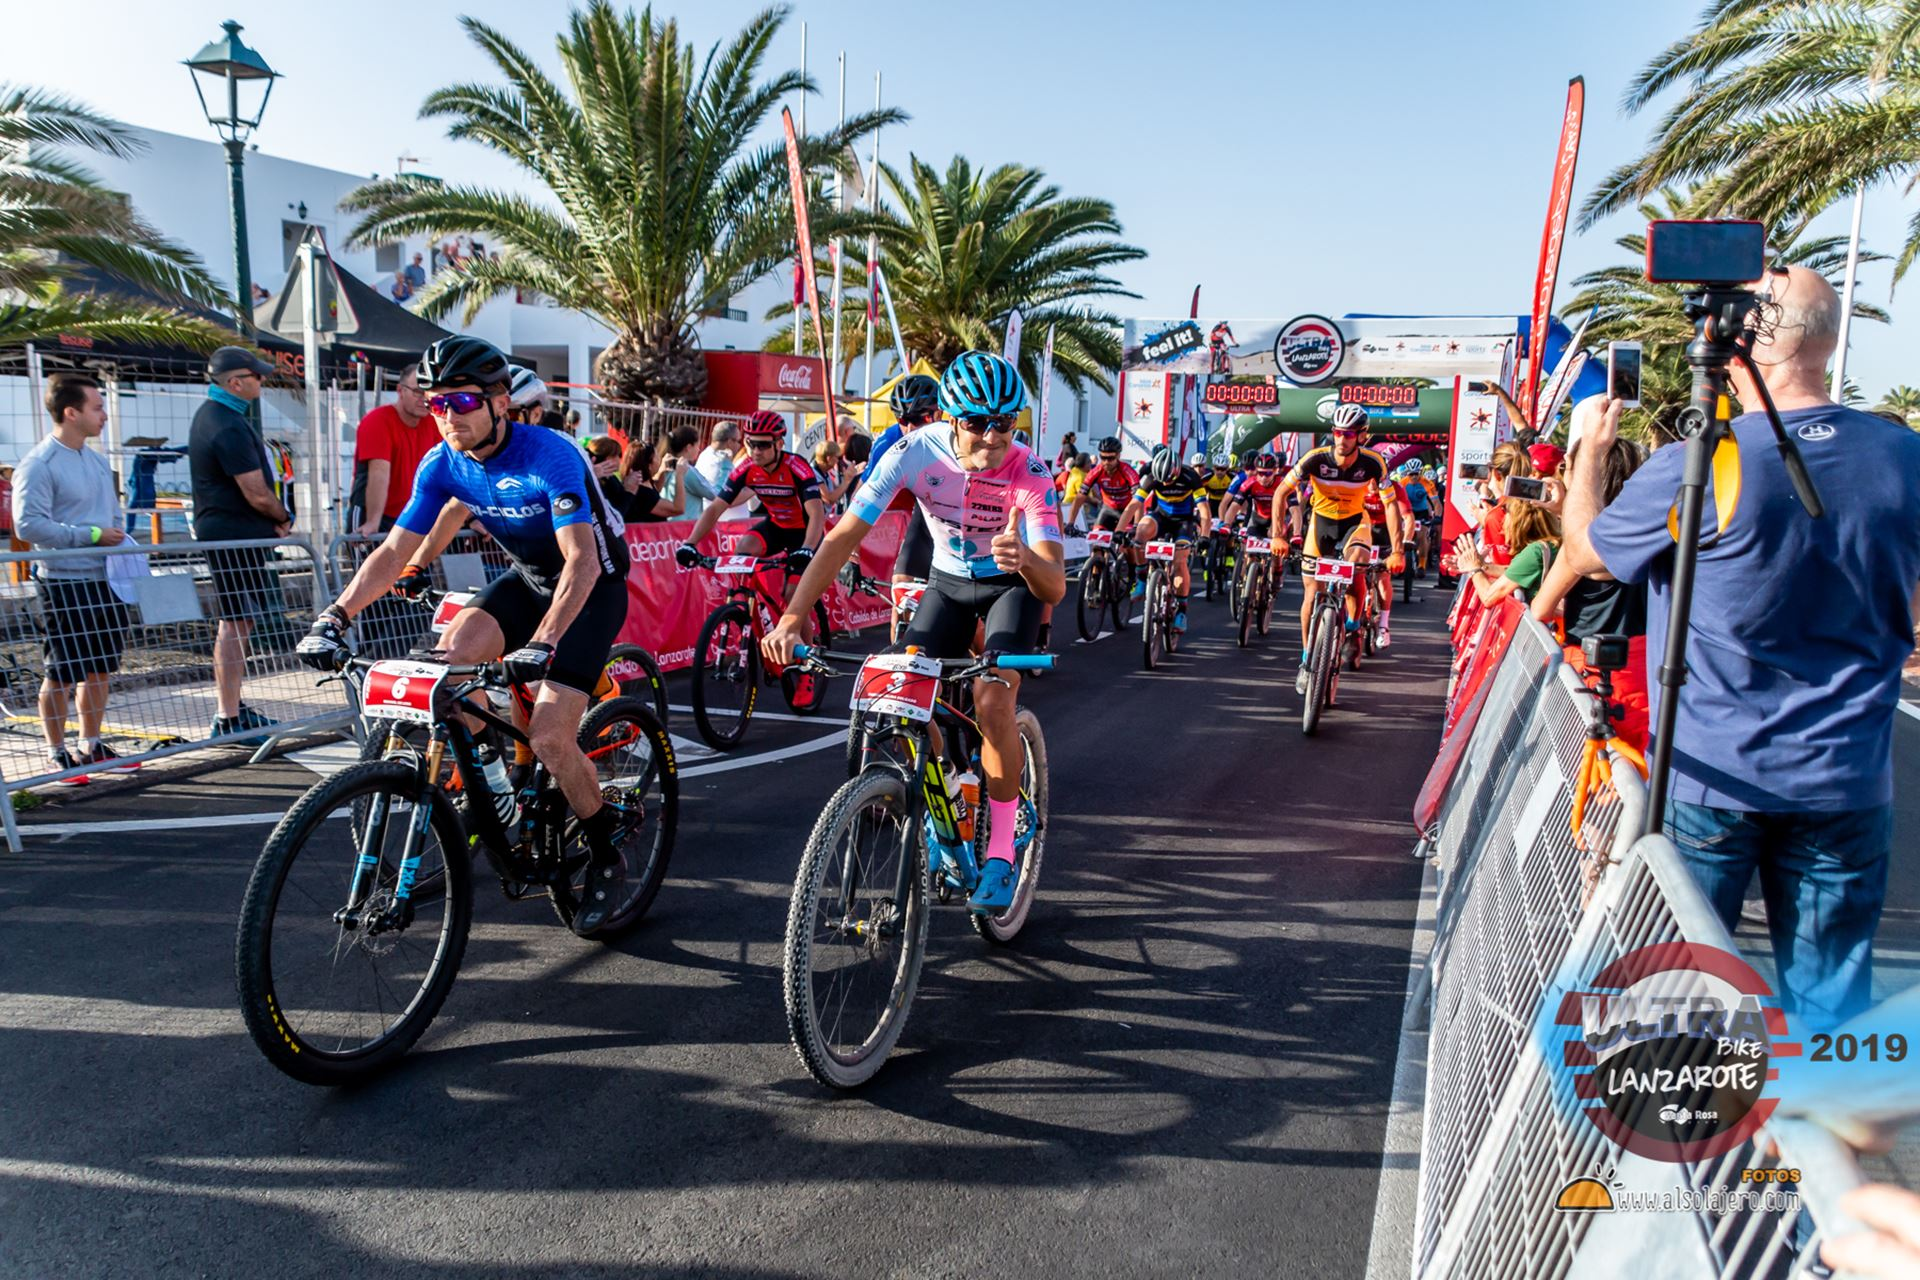 Salida 2ª Etapa Ultrabike 2019 Fotos Alsolajero.com-25